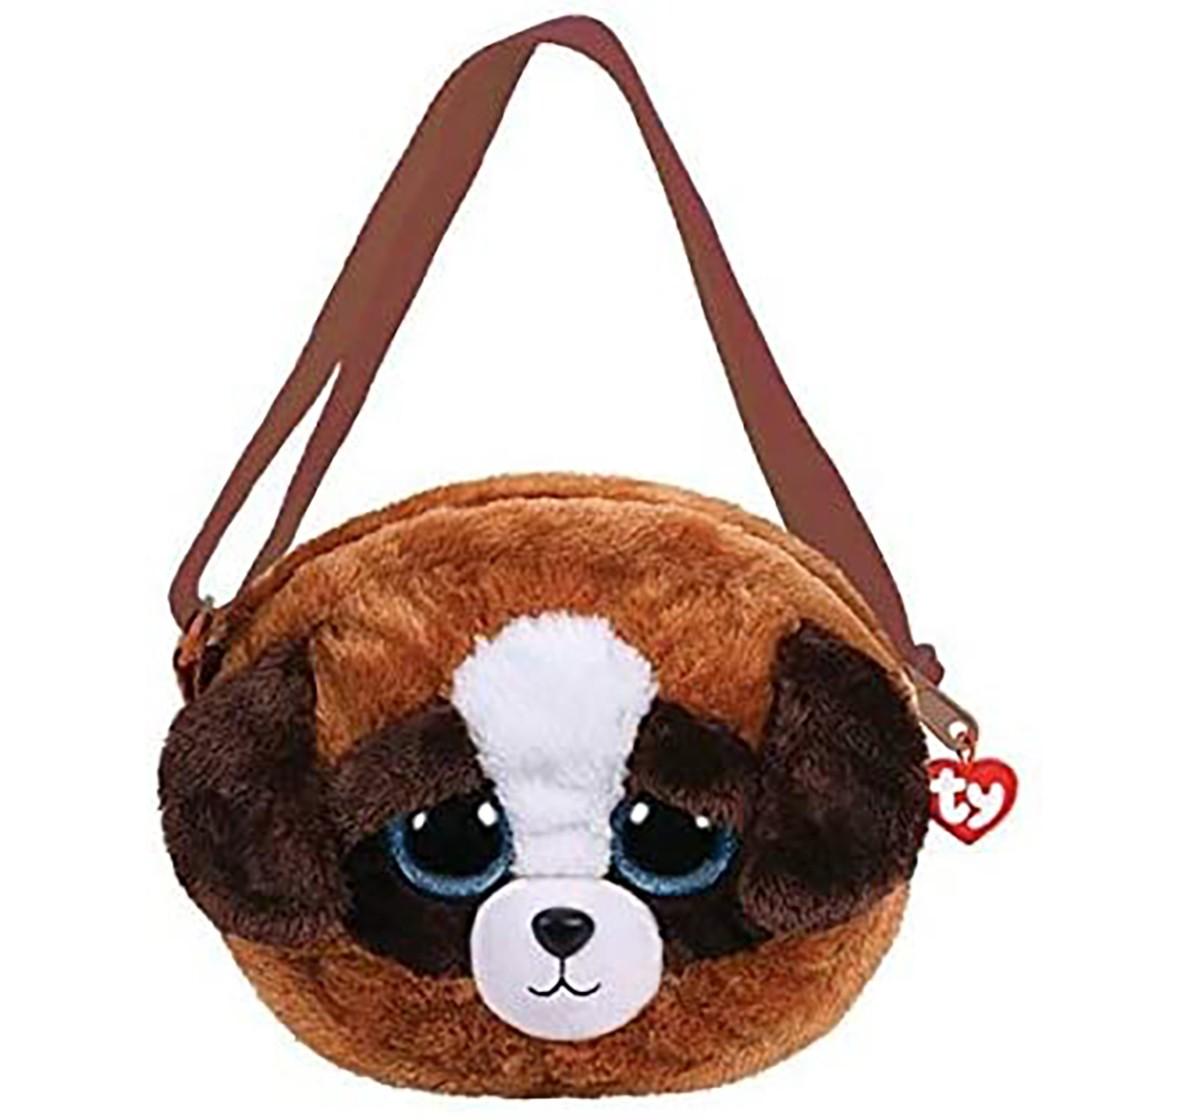 Ty Duke  - Shoulder Bag/Purse Plush Accessories for Girls age 3Y+ - 15 Cm